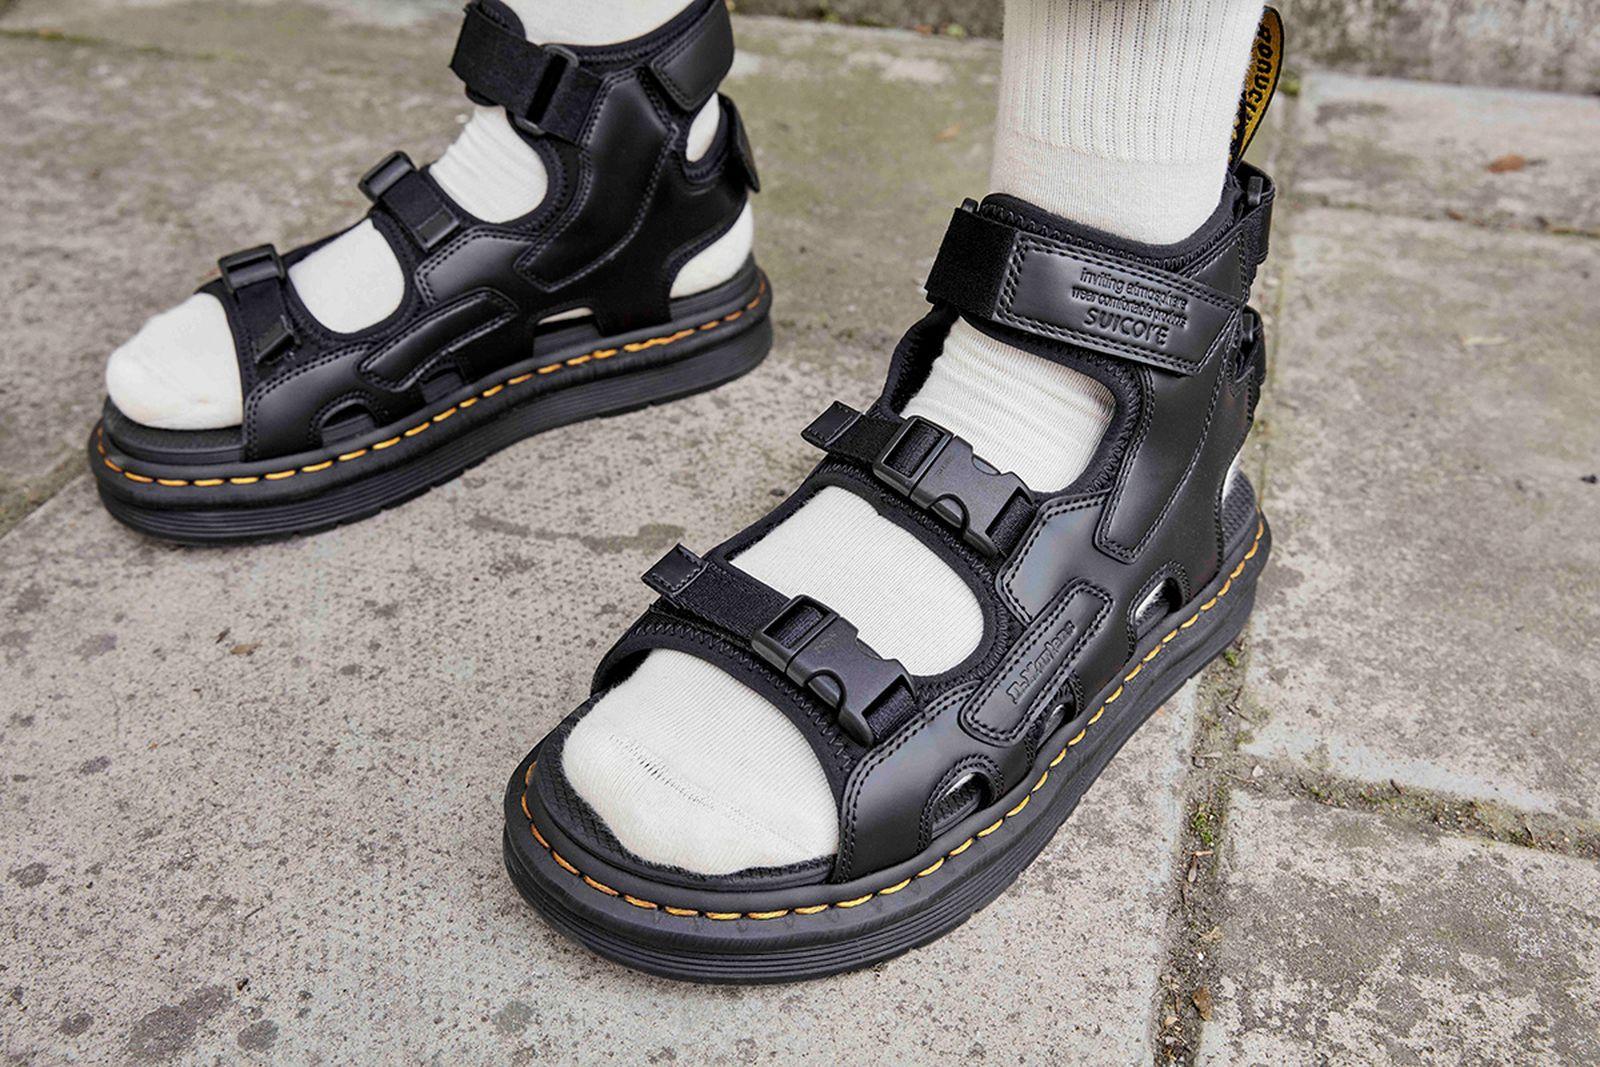 dr-martens-suicoke-sandals-release-date-price-mood-01